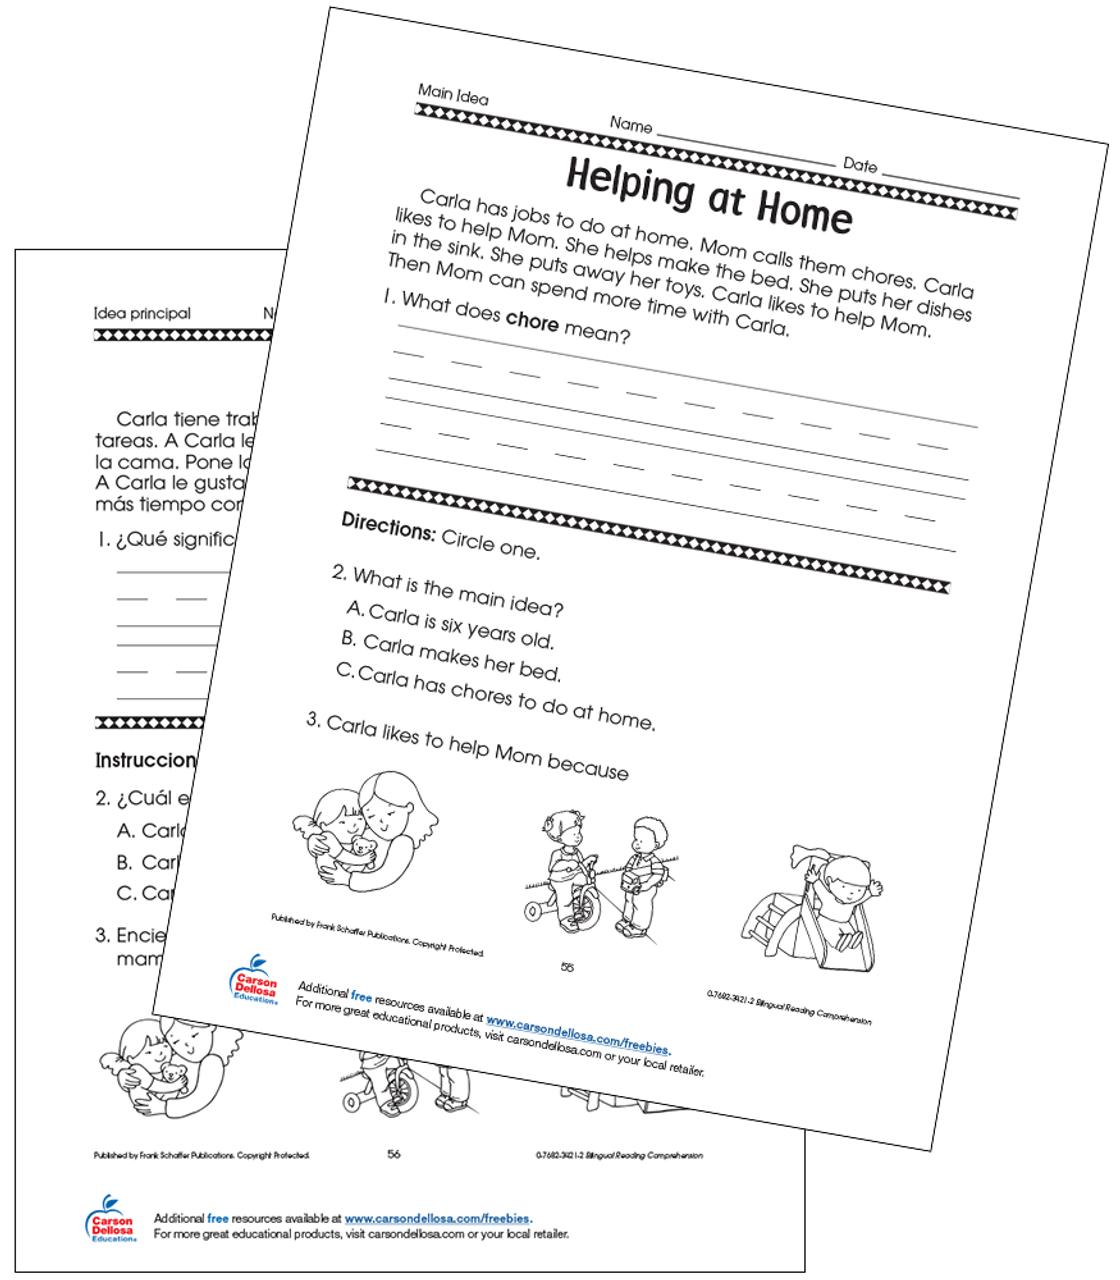 Helping at Home Grade 1 Bilingual Free Printable   Carson Dellosa [ 1280 x 1120 Pixel ]